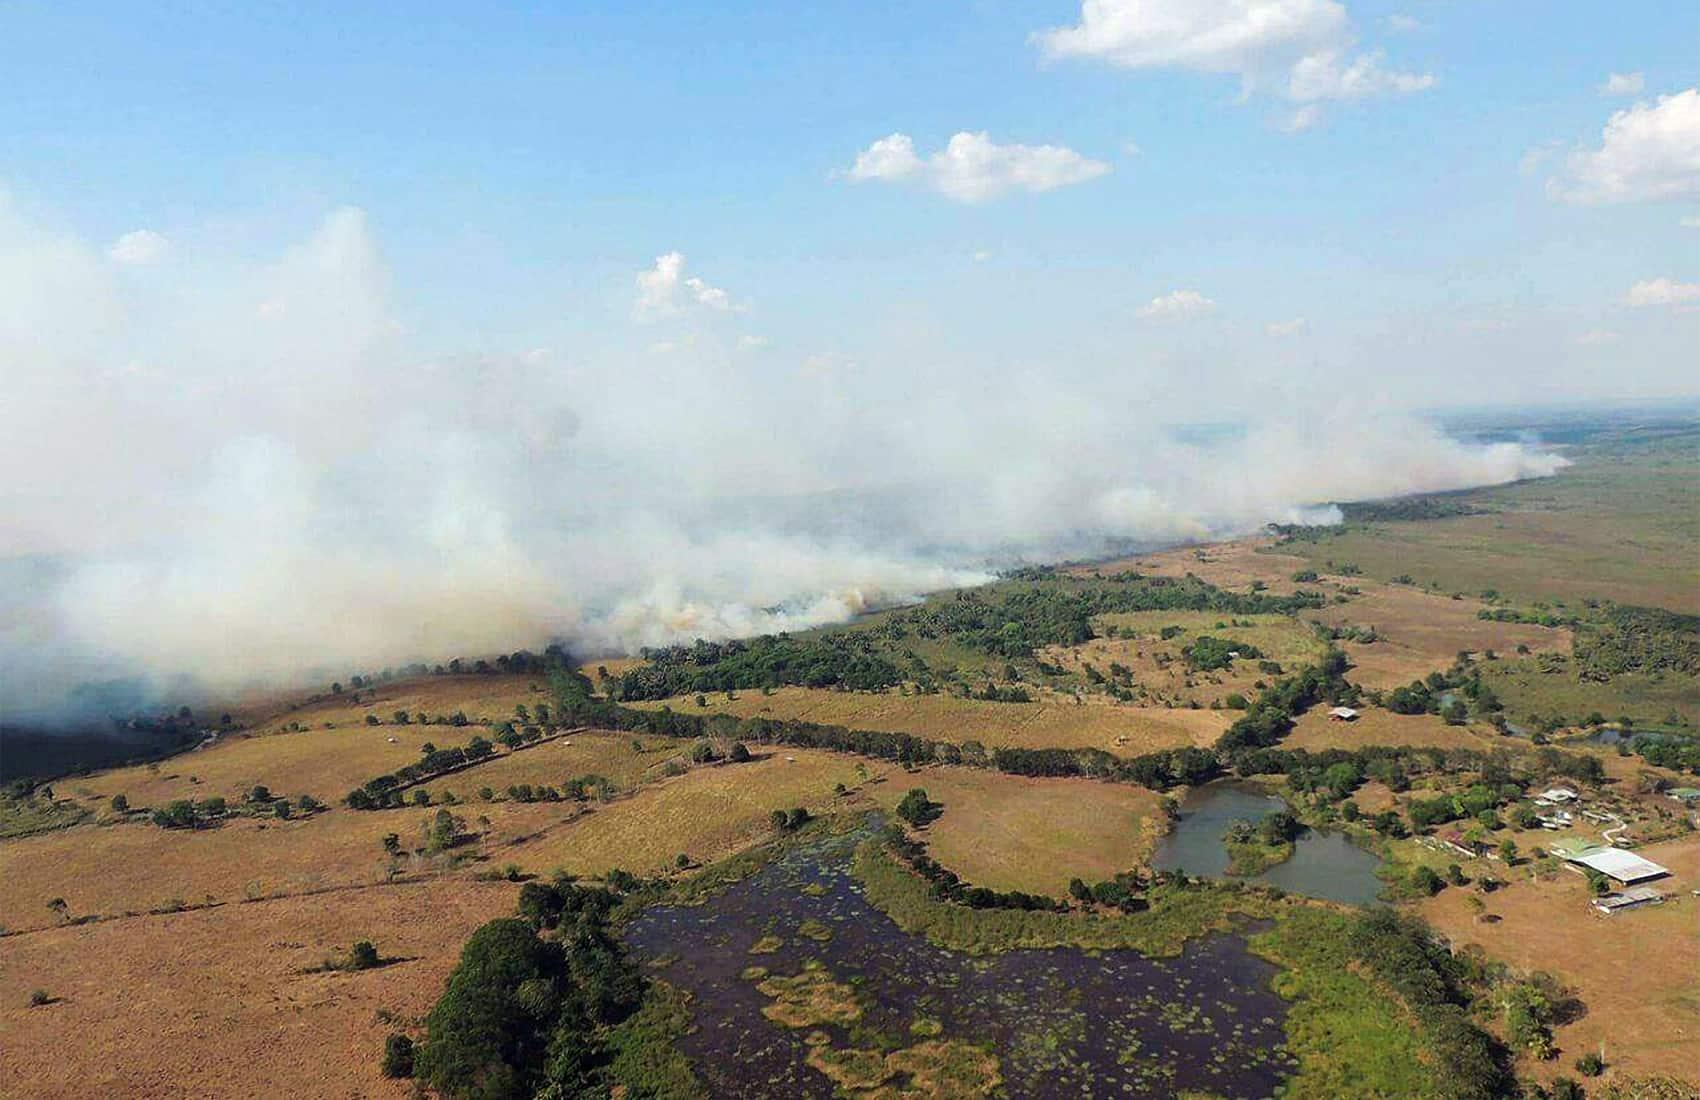 Wildfires at Corredor Fronterizo. April 2016